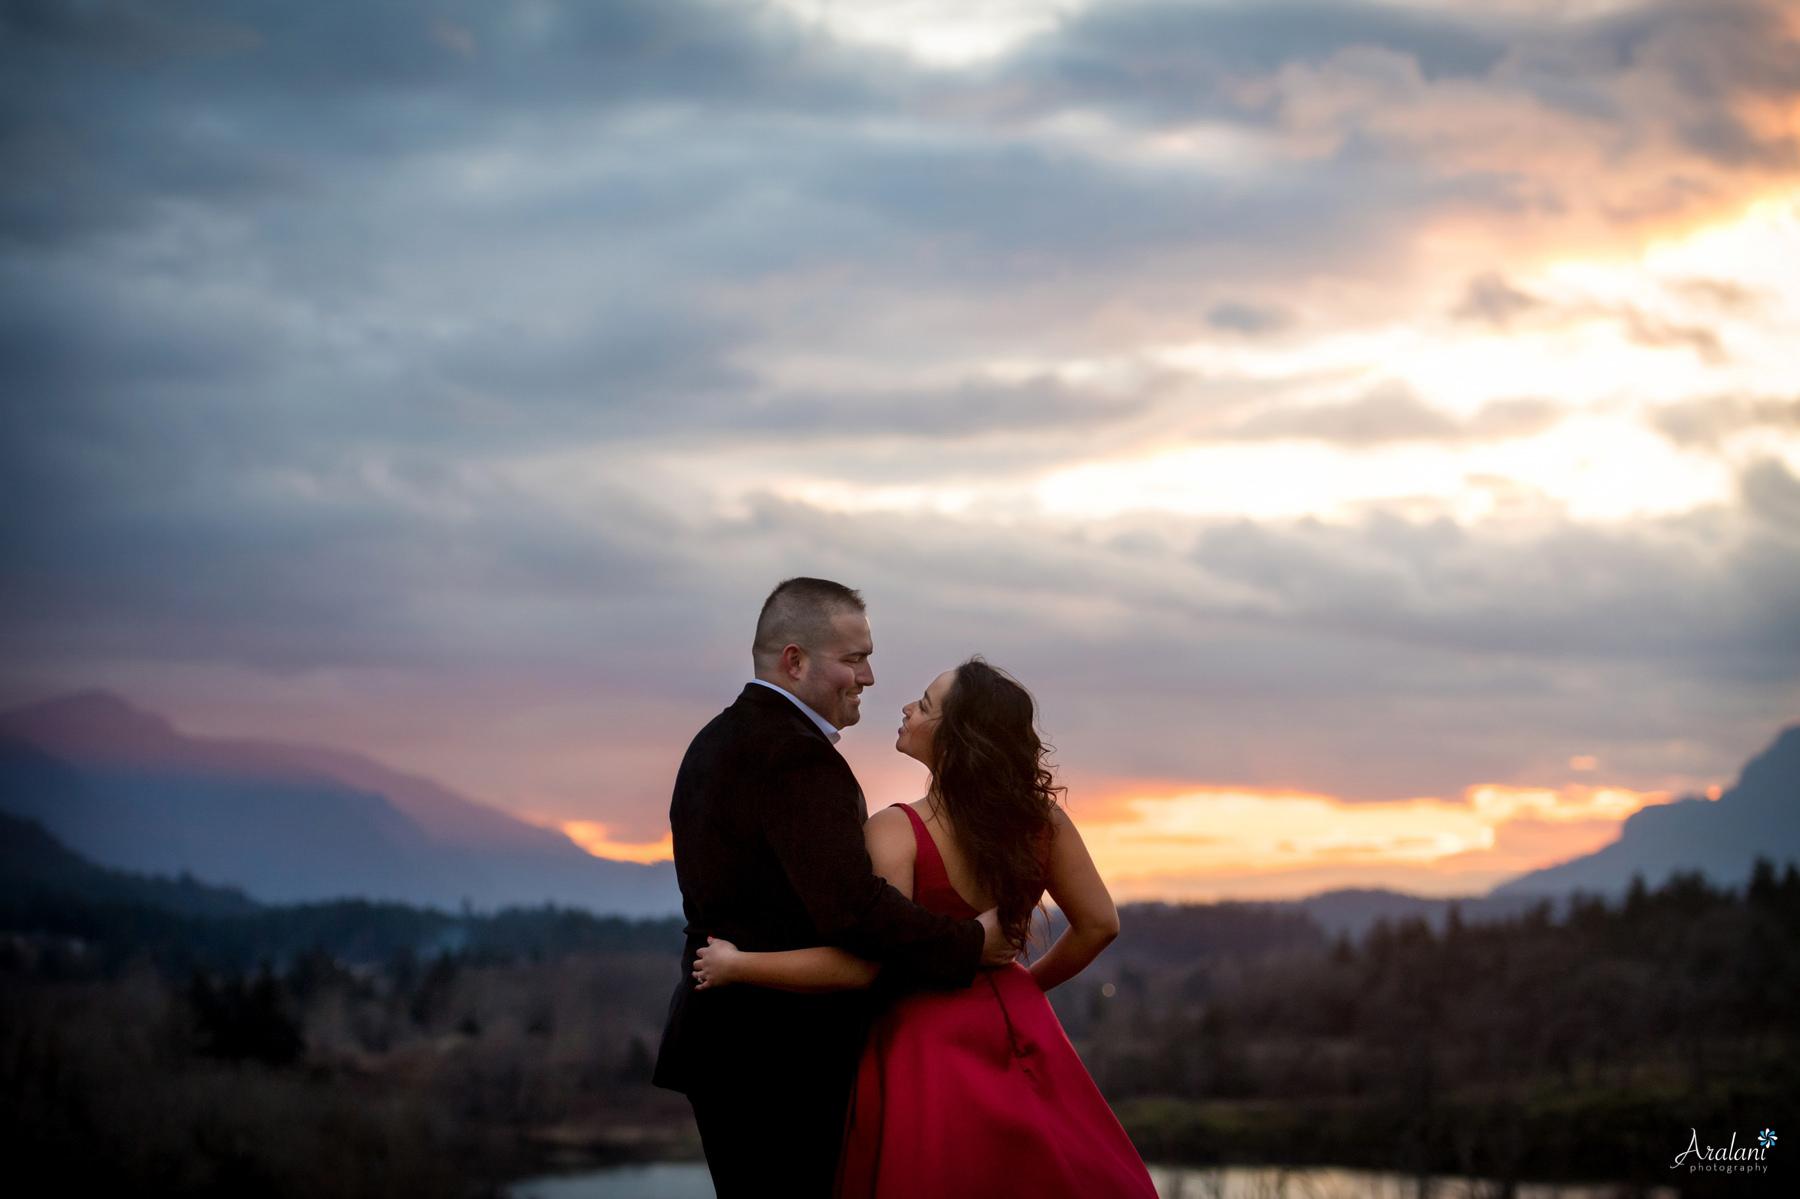 Columbia_River_Gorge_Sunset_Engagement0014.jpg